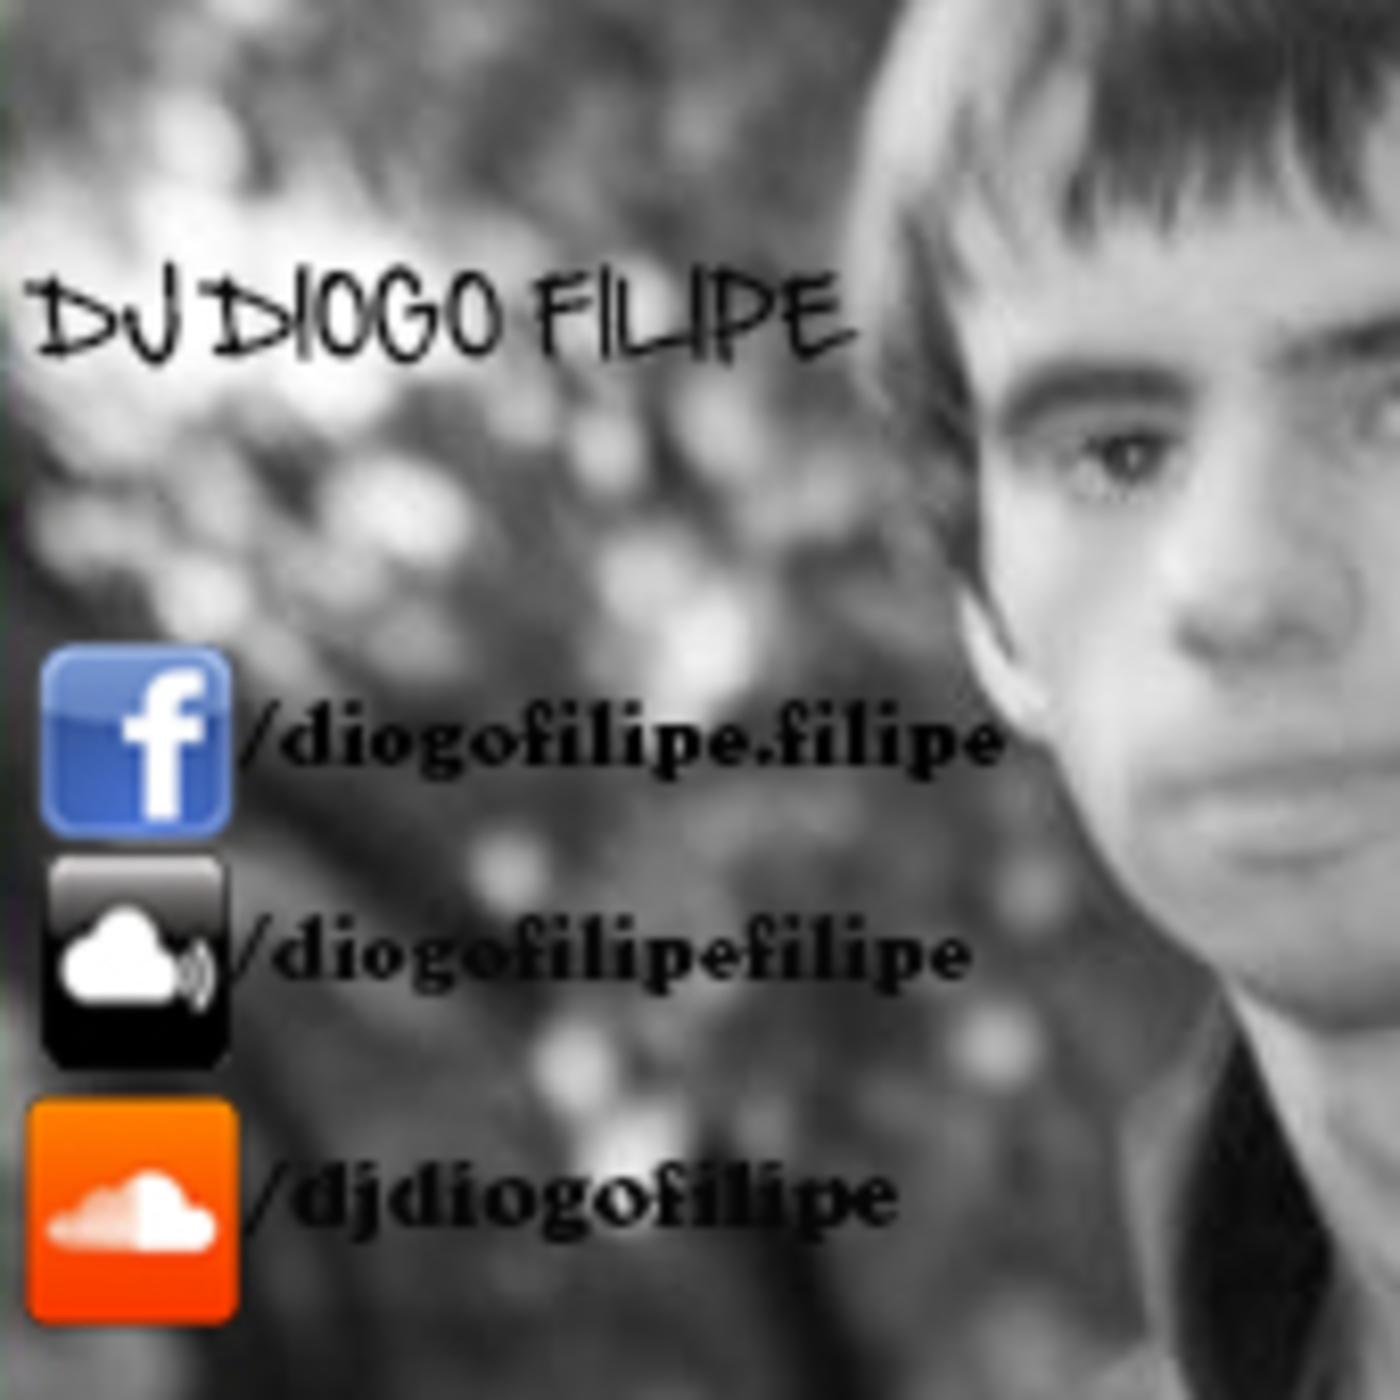 Diogo Filipe's Podcast